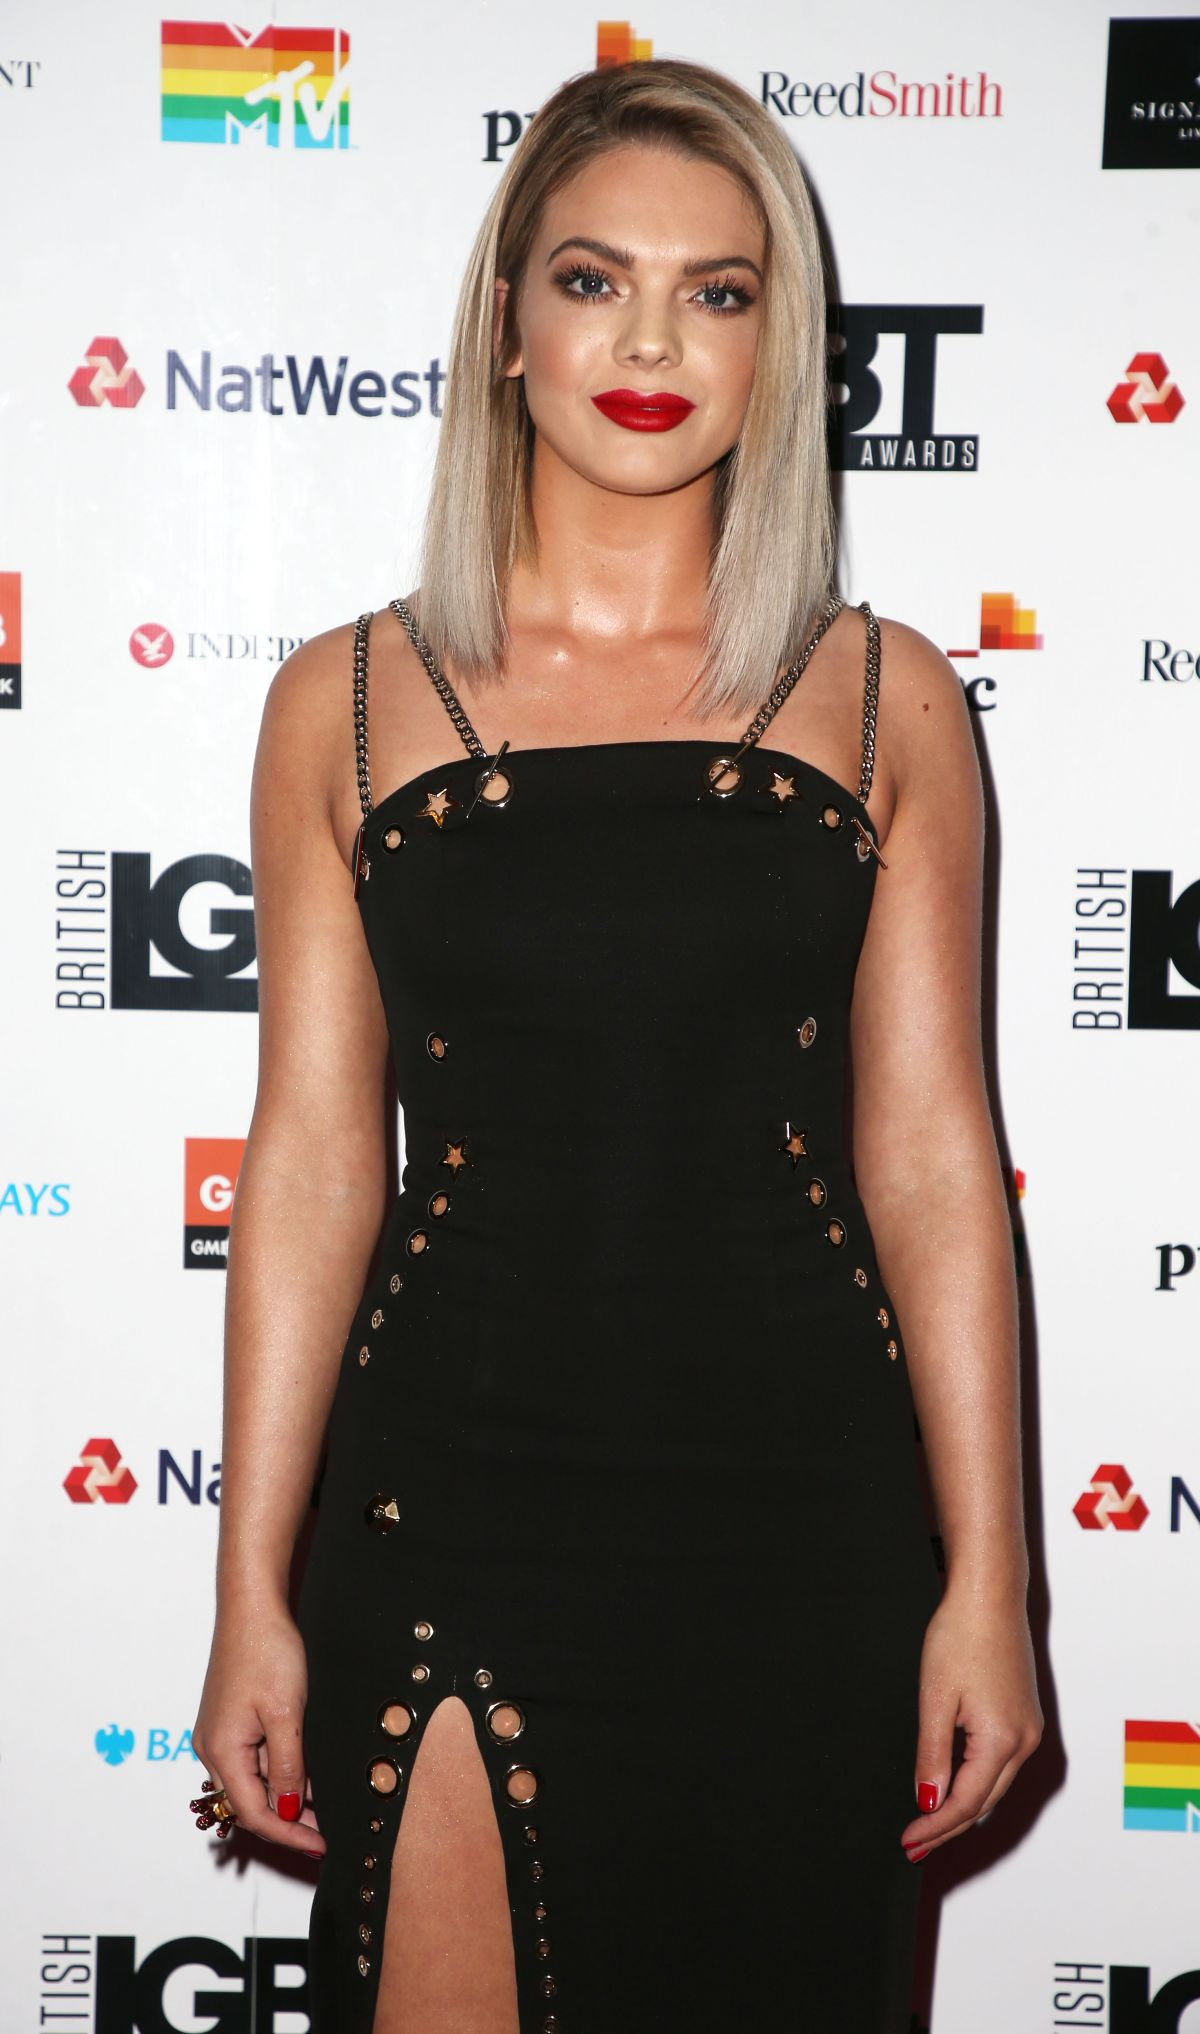 LOUISA JOHNSON at British LGBT Awards in London 05/12/2017